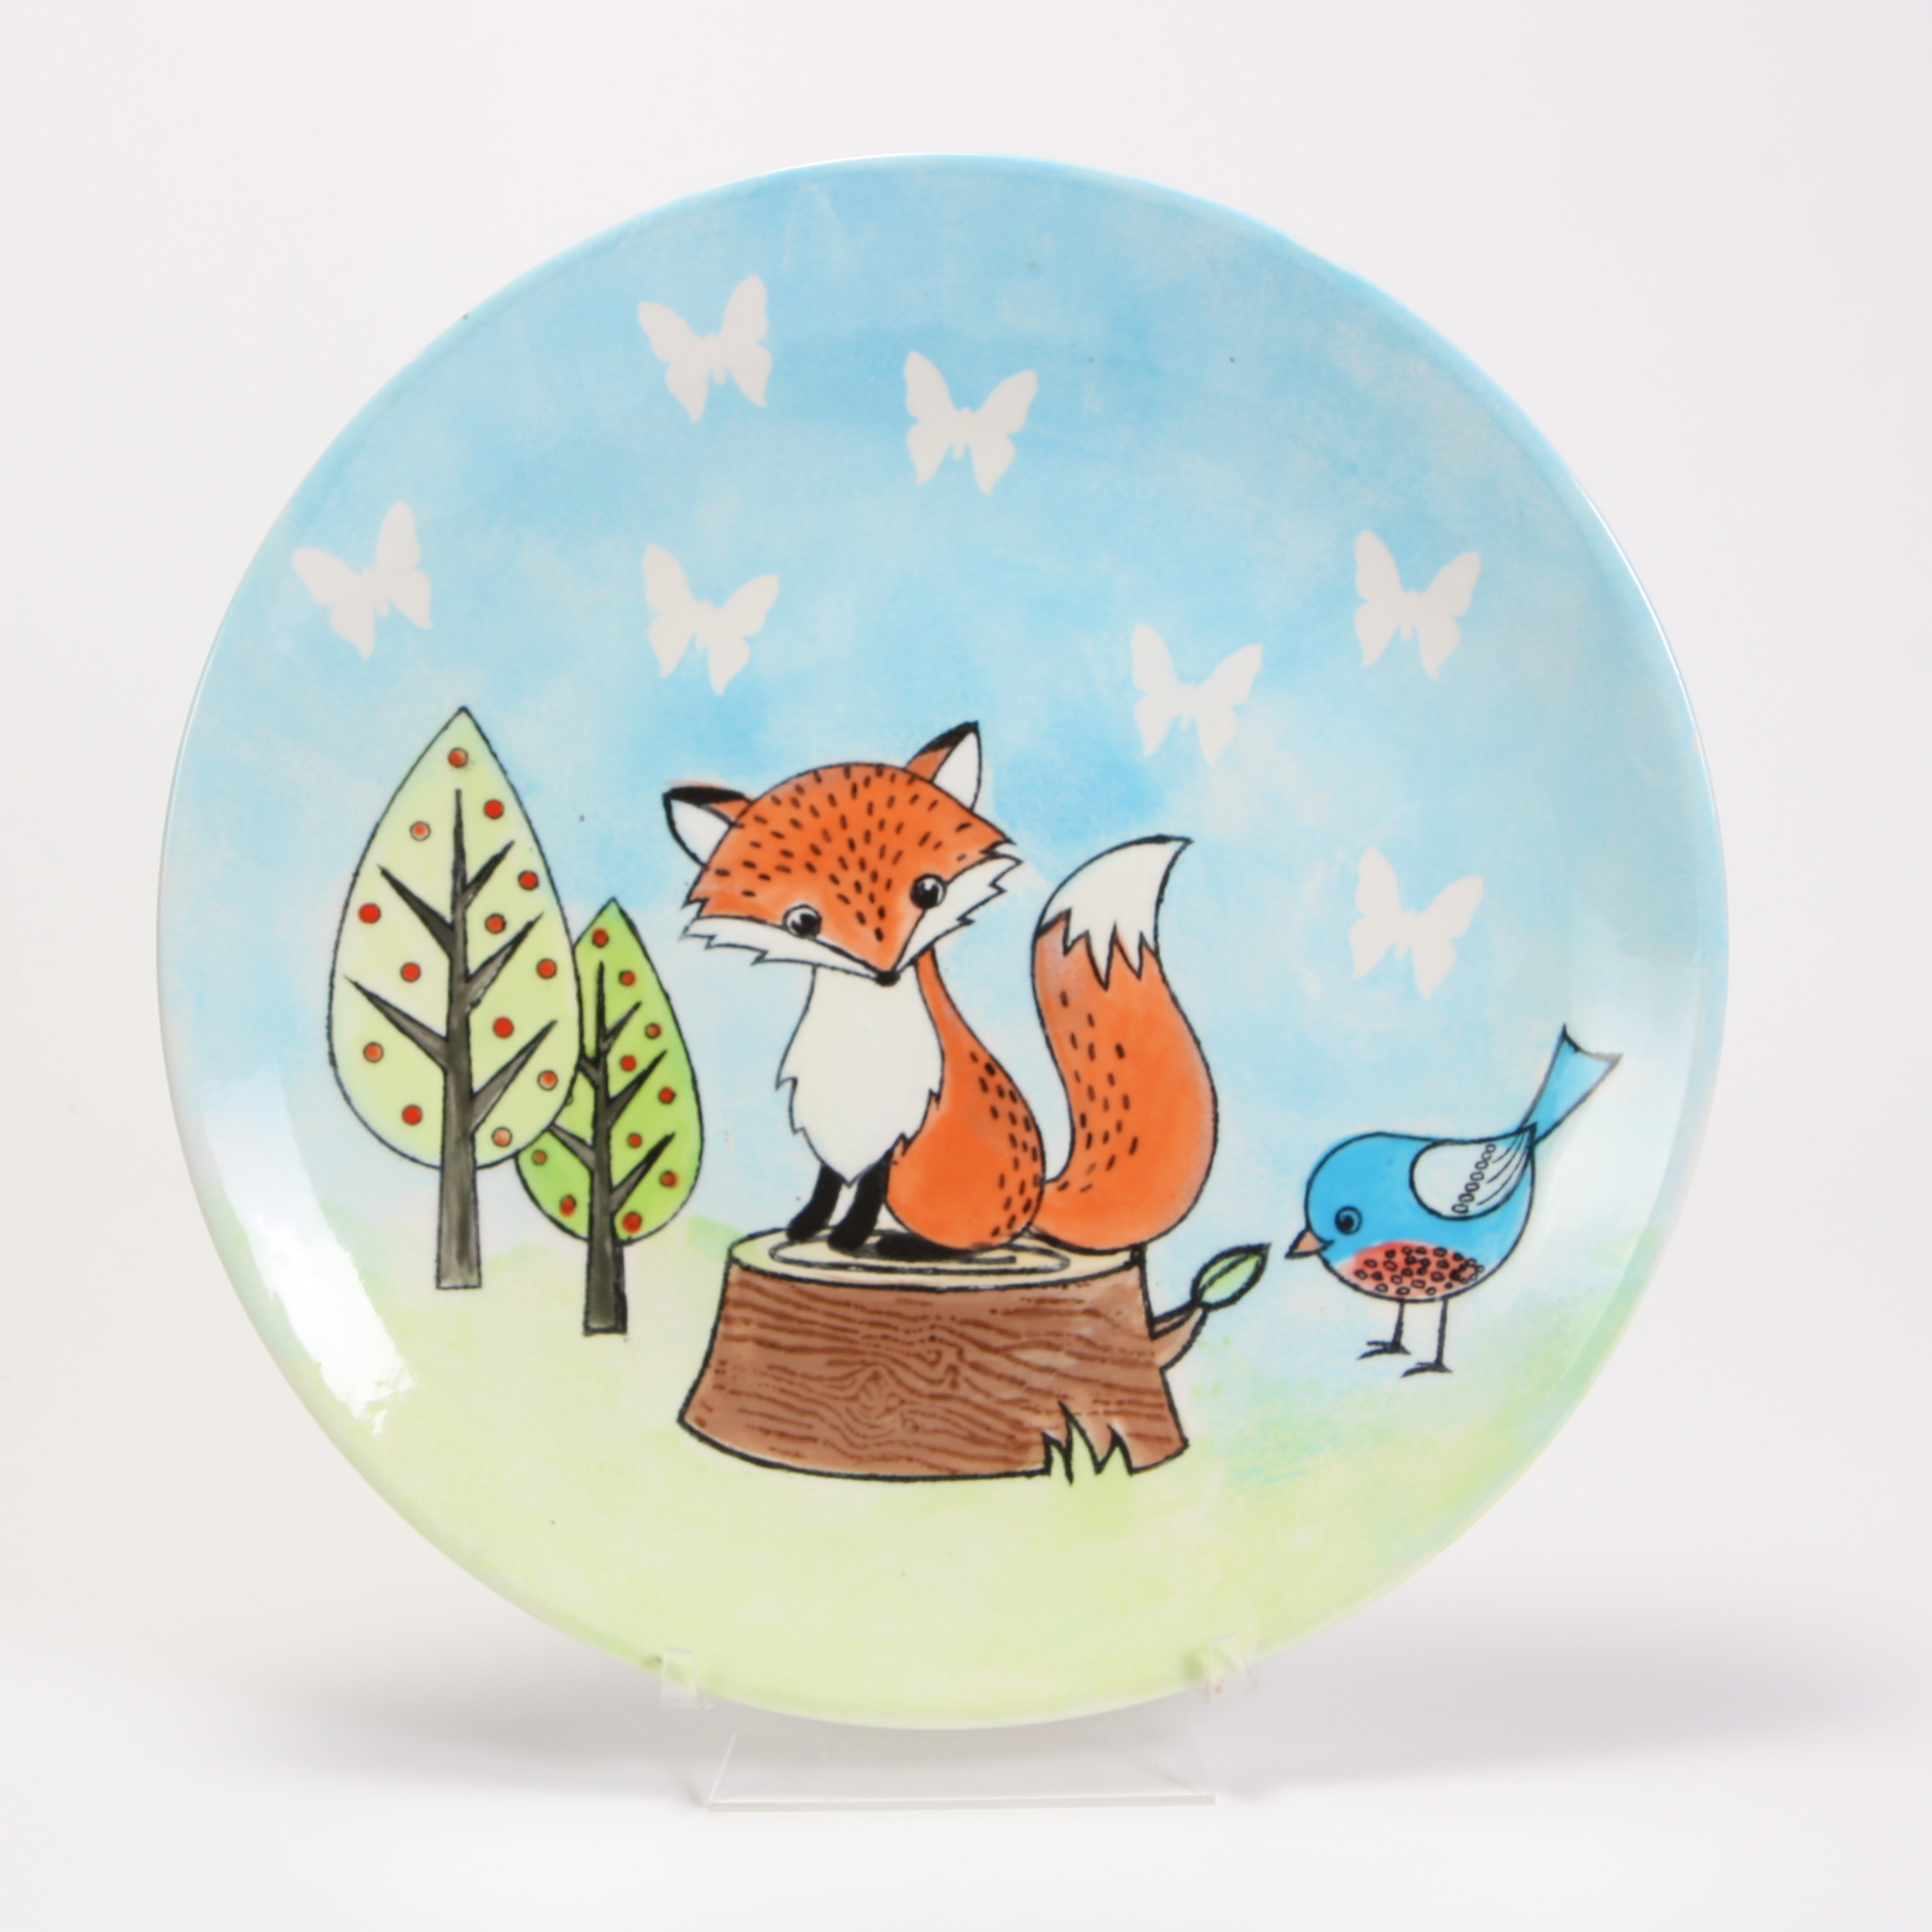 DSS0161_fox-plate-crop